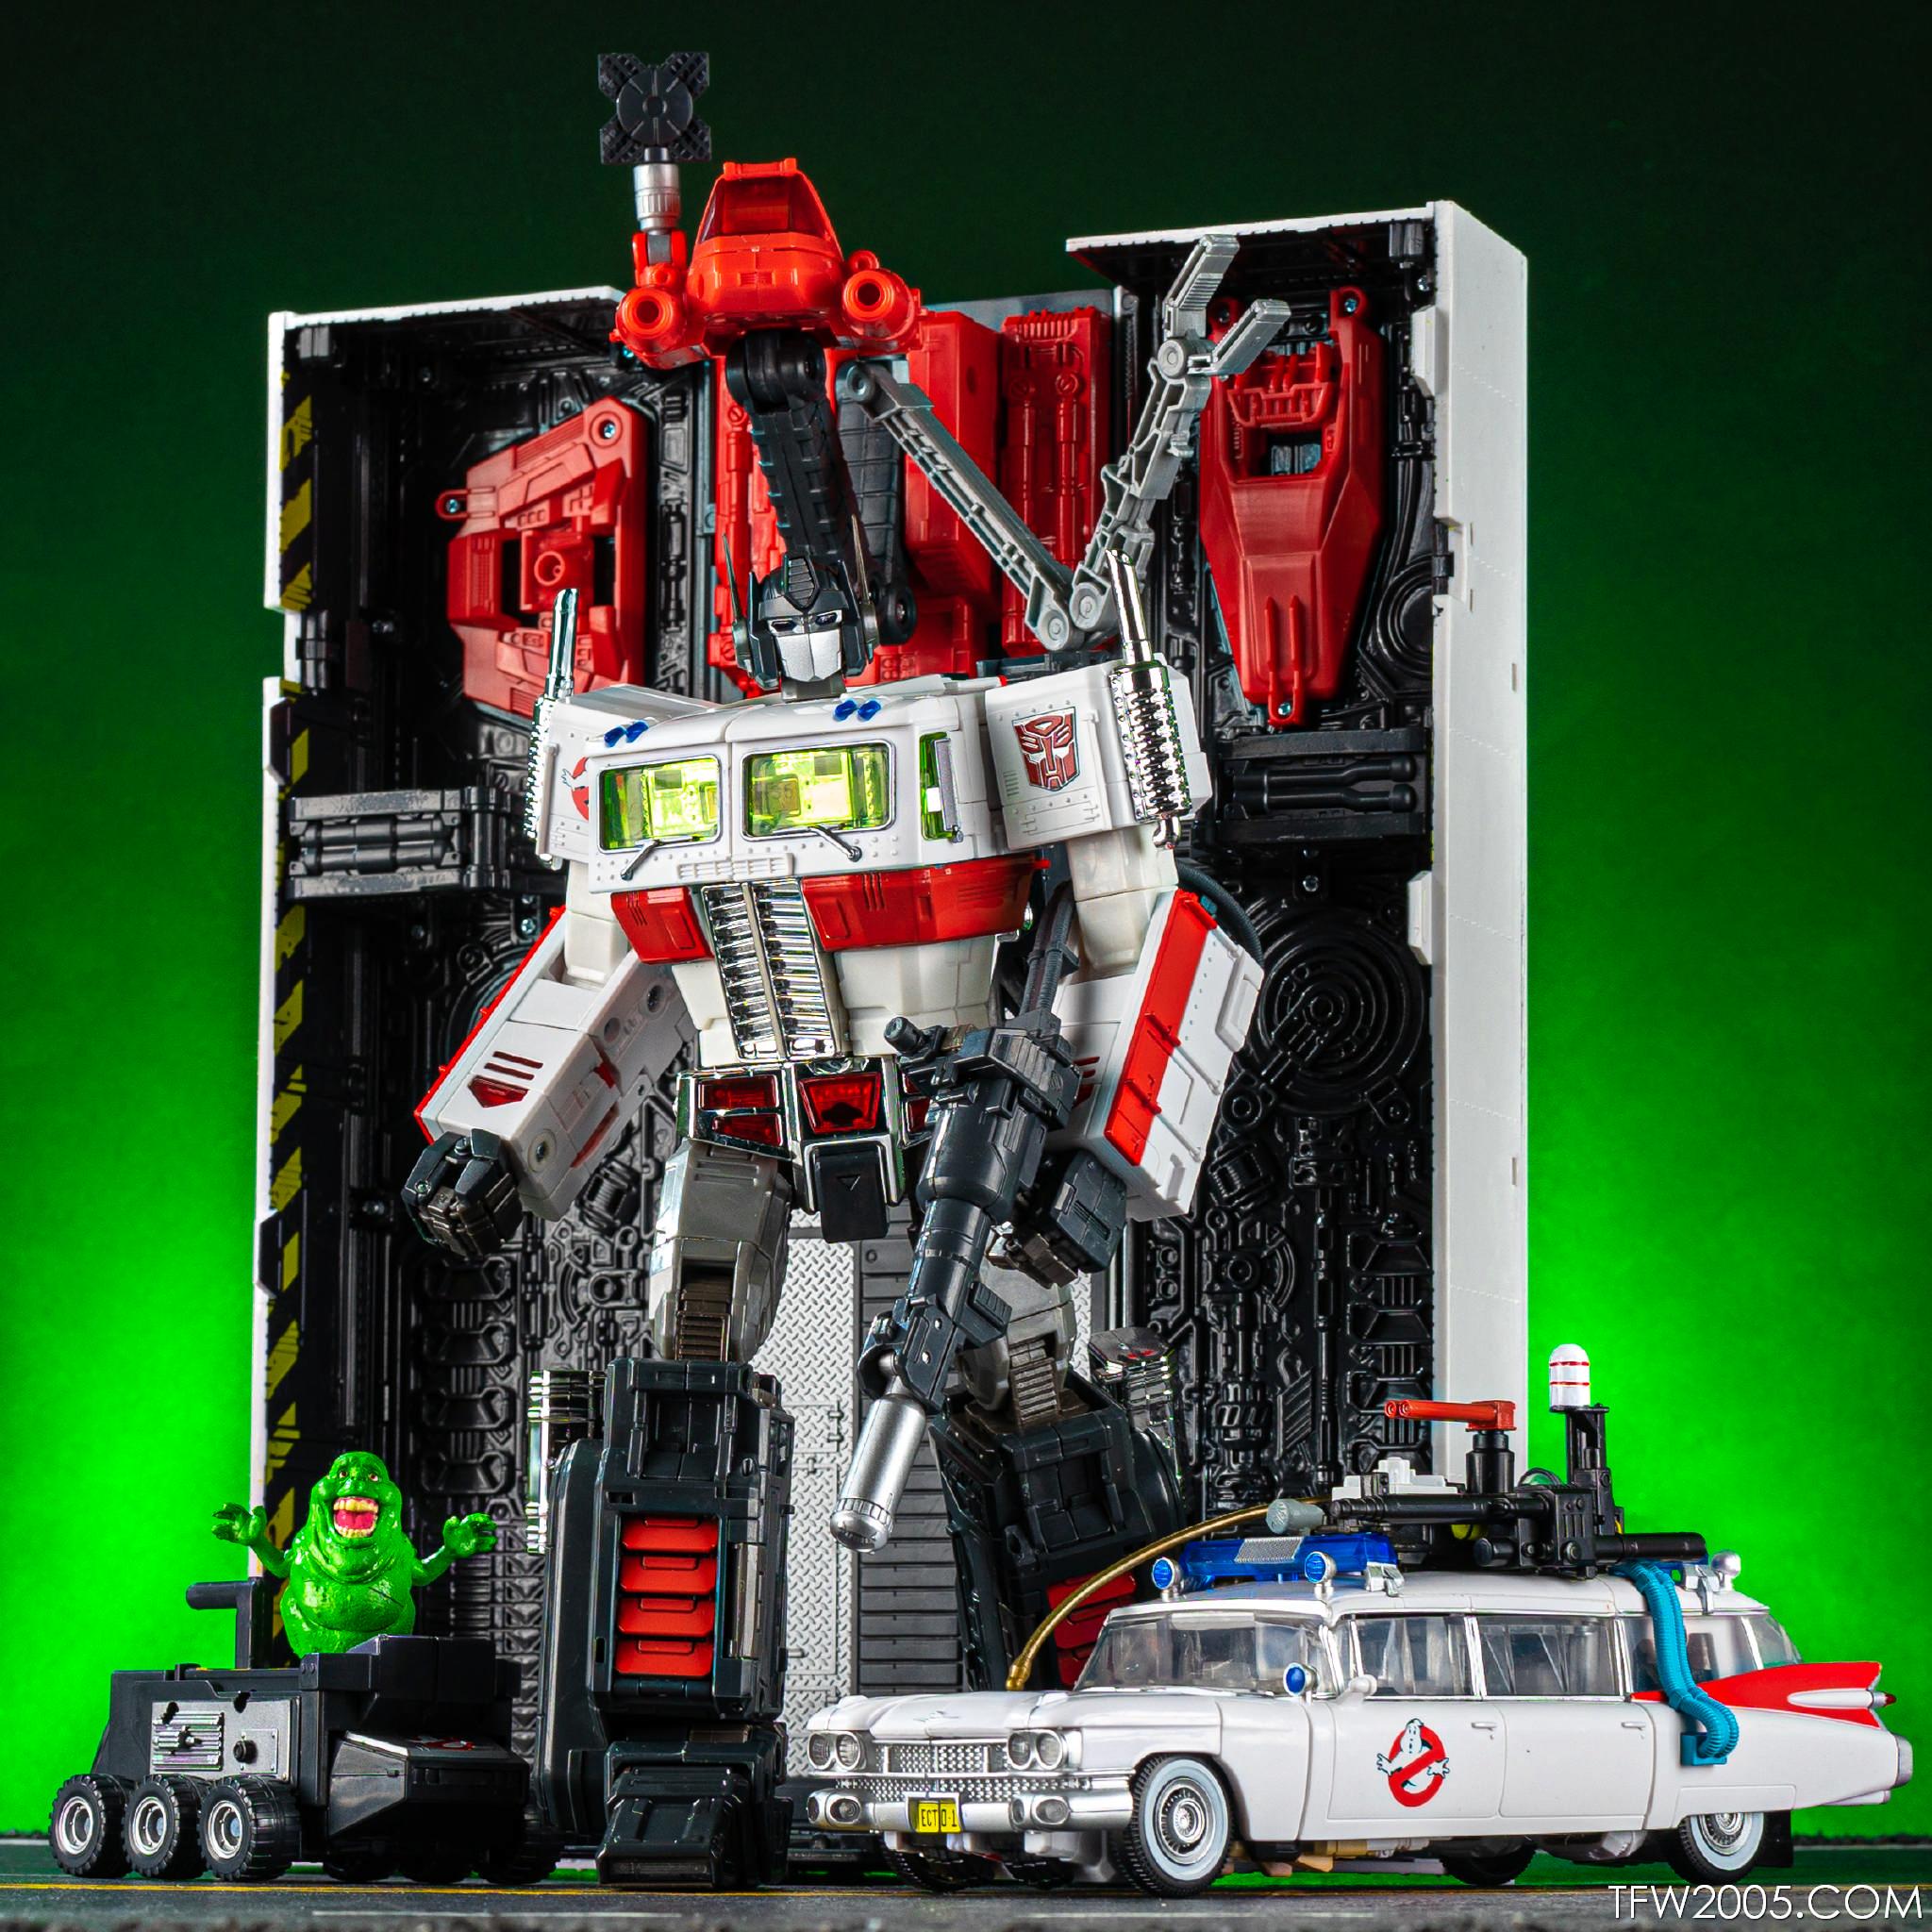 2019 SDCC Hasbro Ghostbuster Transformers Ecto-35 MP-10G Optimis Prime no Box